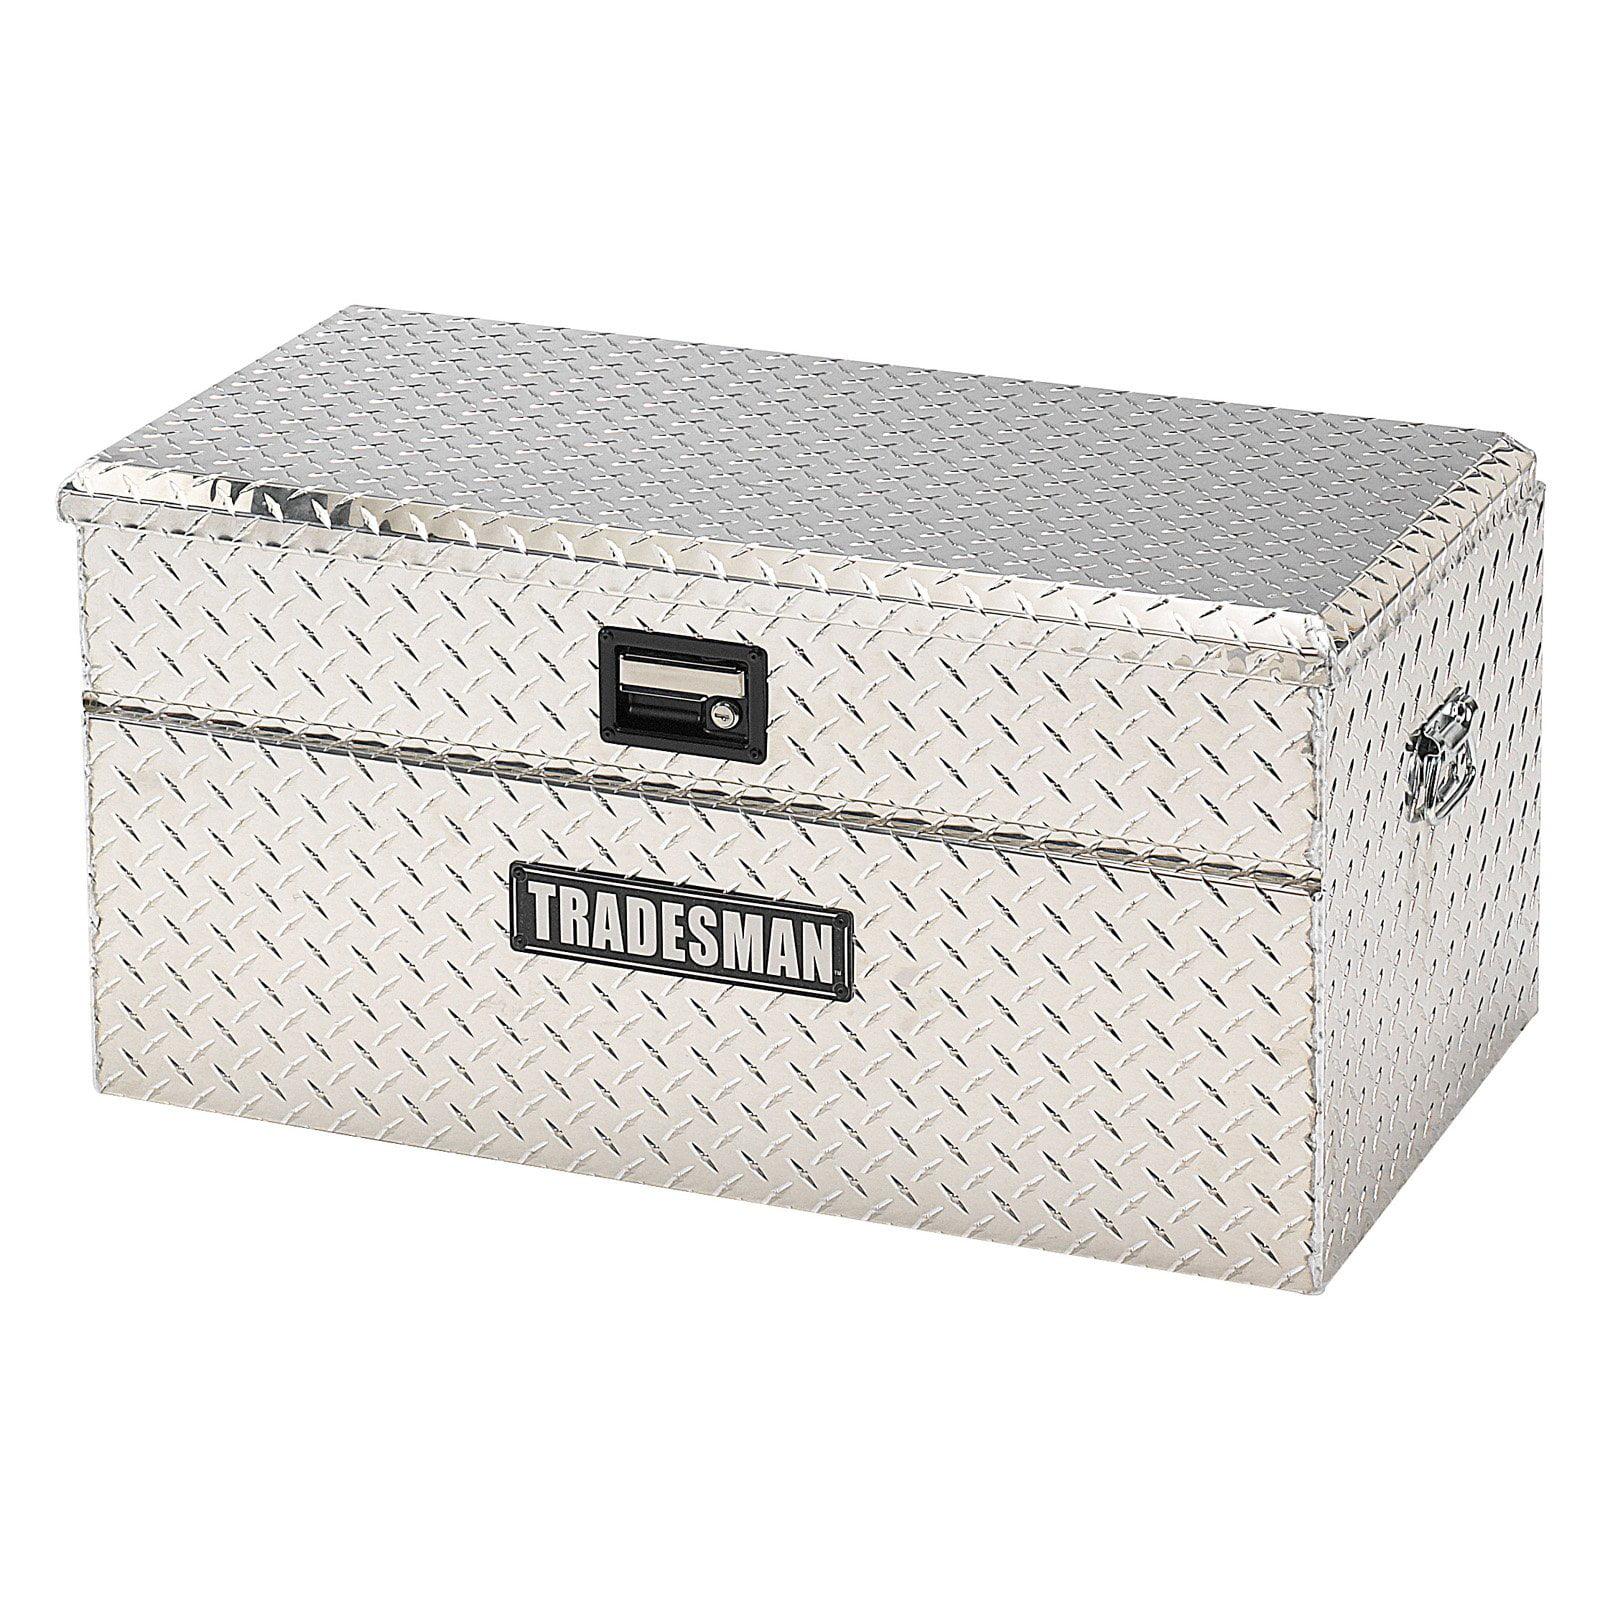 Small Truck Tool Box >> Tradesman Small Size Single Lid Flush Mount Truck Tool Box